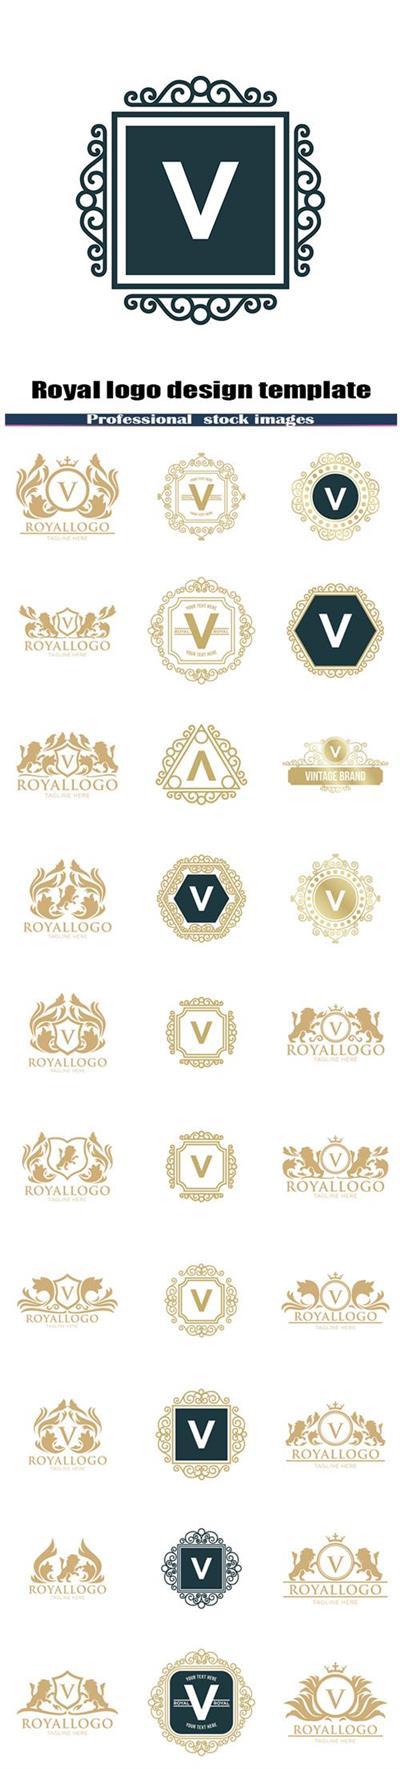 Royal logo design template